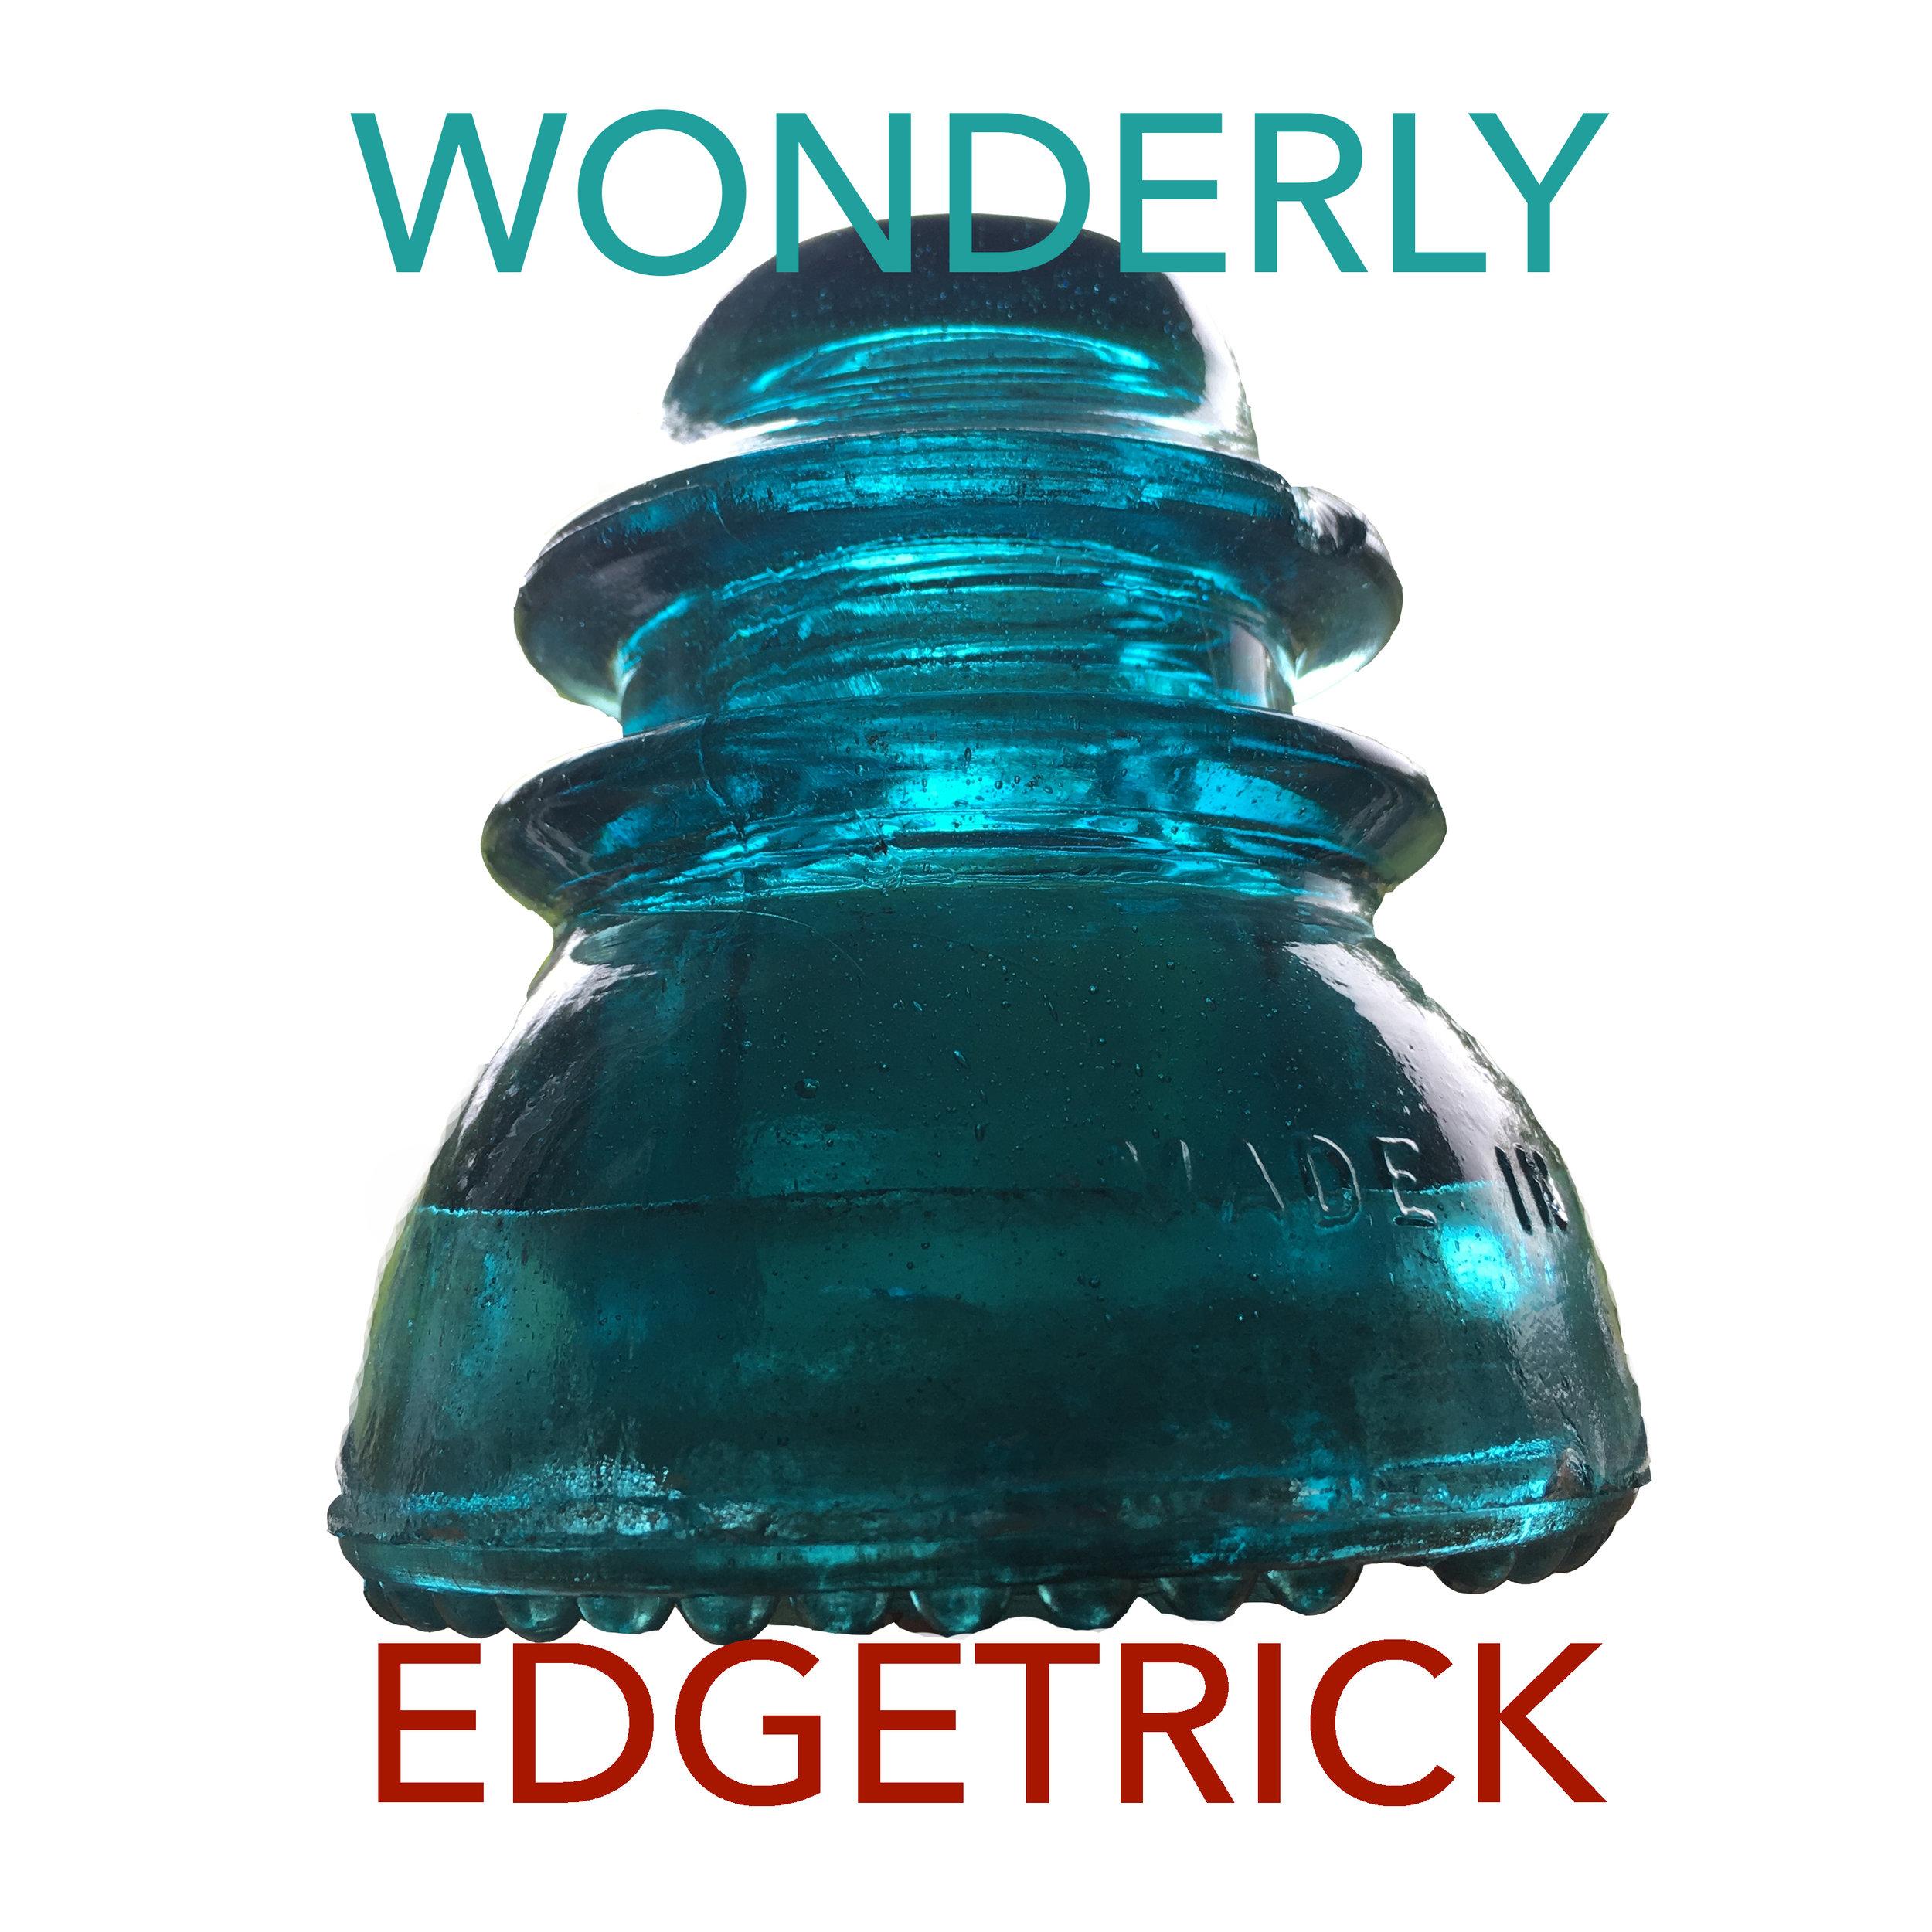 EDGETRICK COVER.jpg